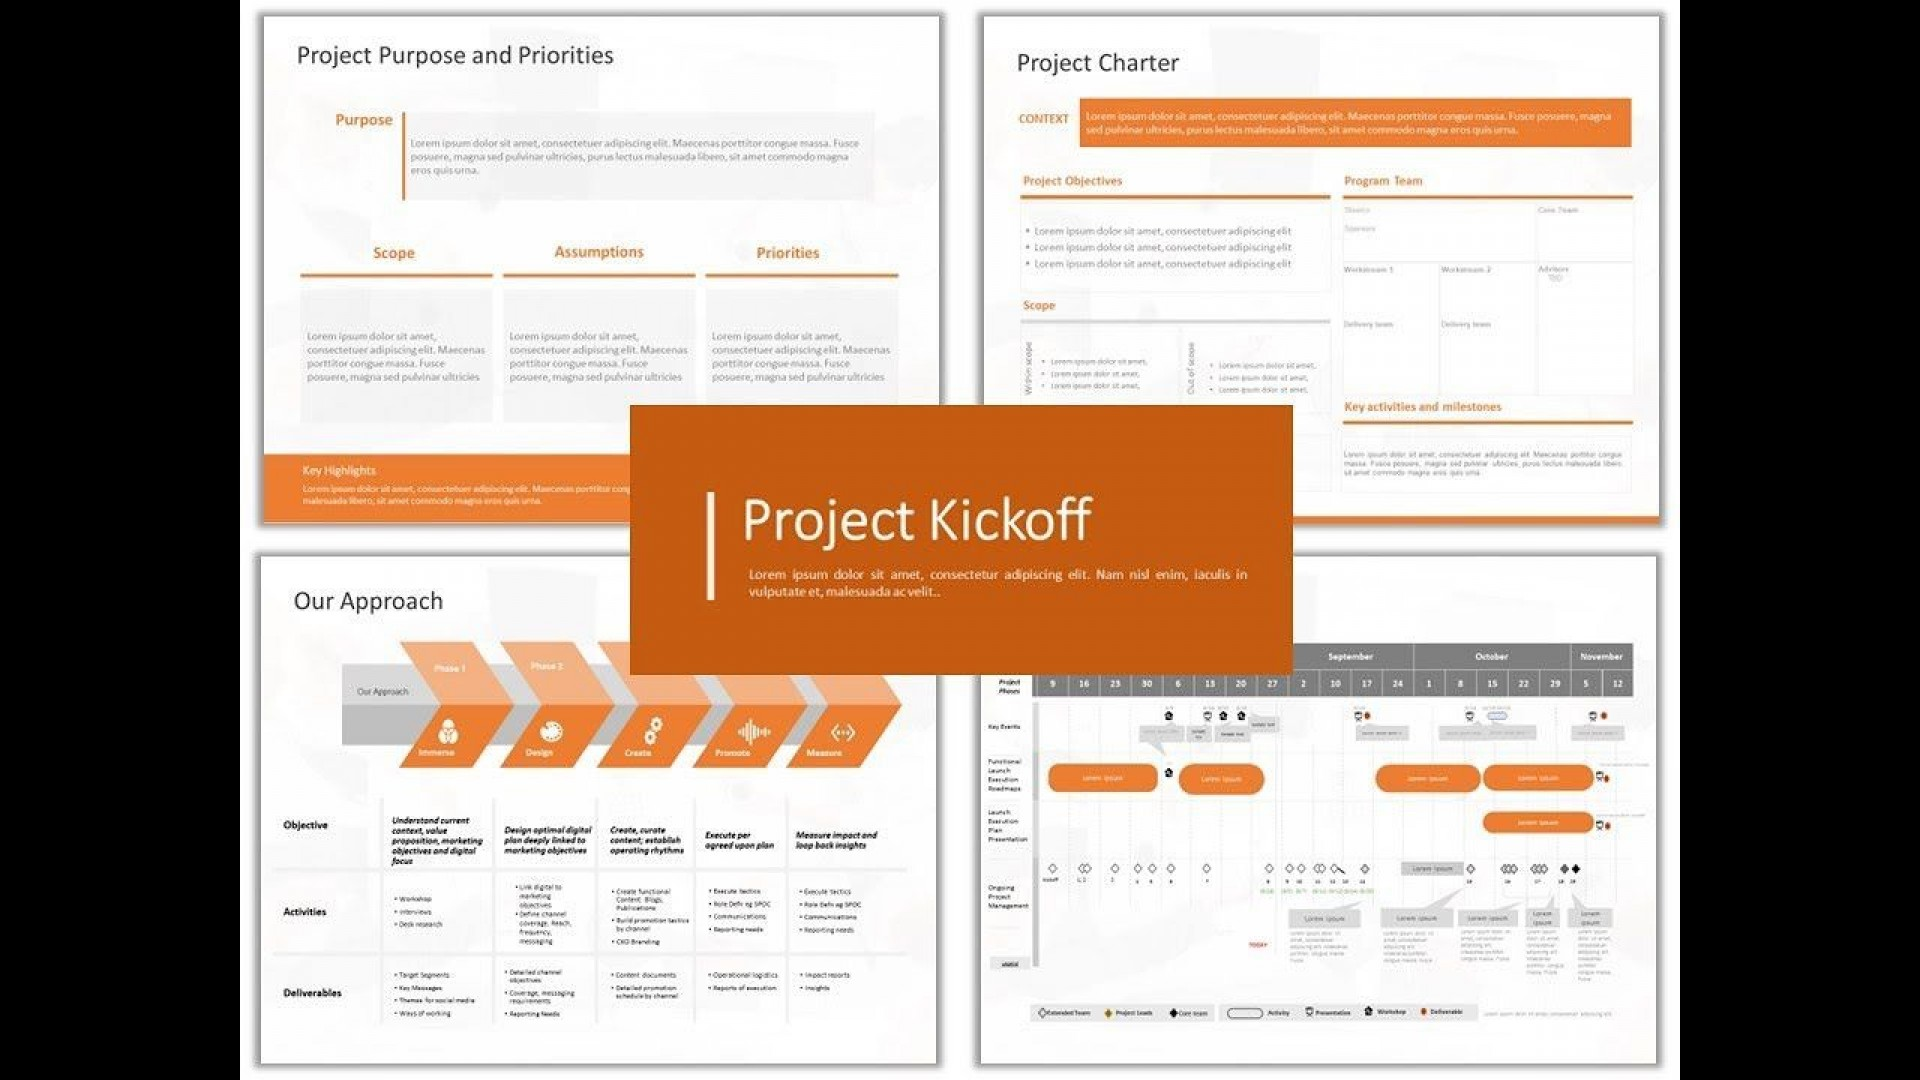 002 Wondrou Project Management Kickoff Meeting Template Ppt Idea 1920